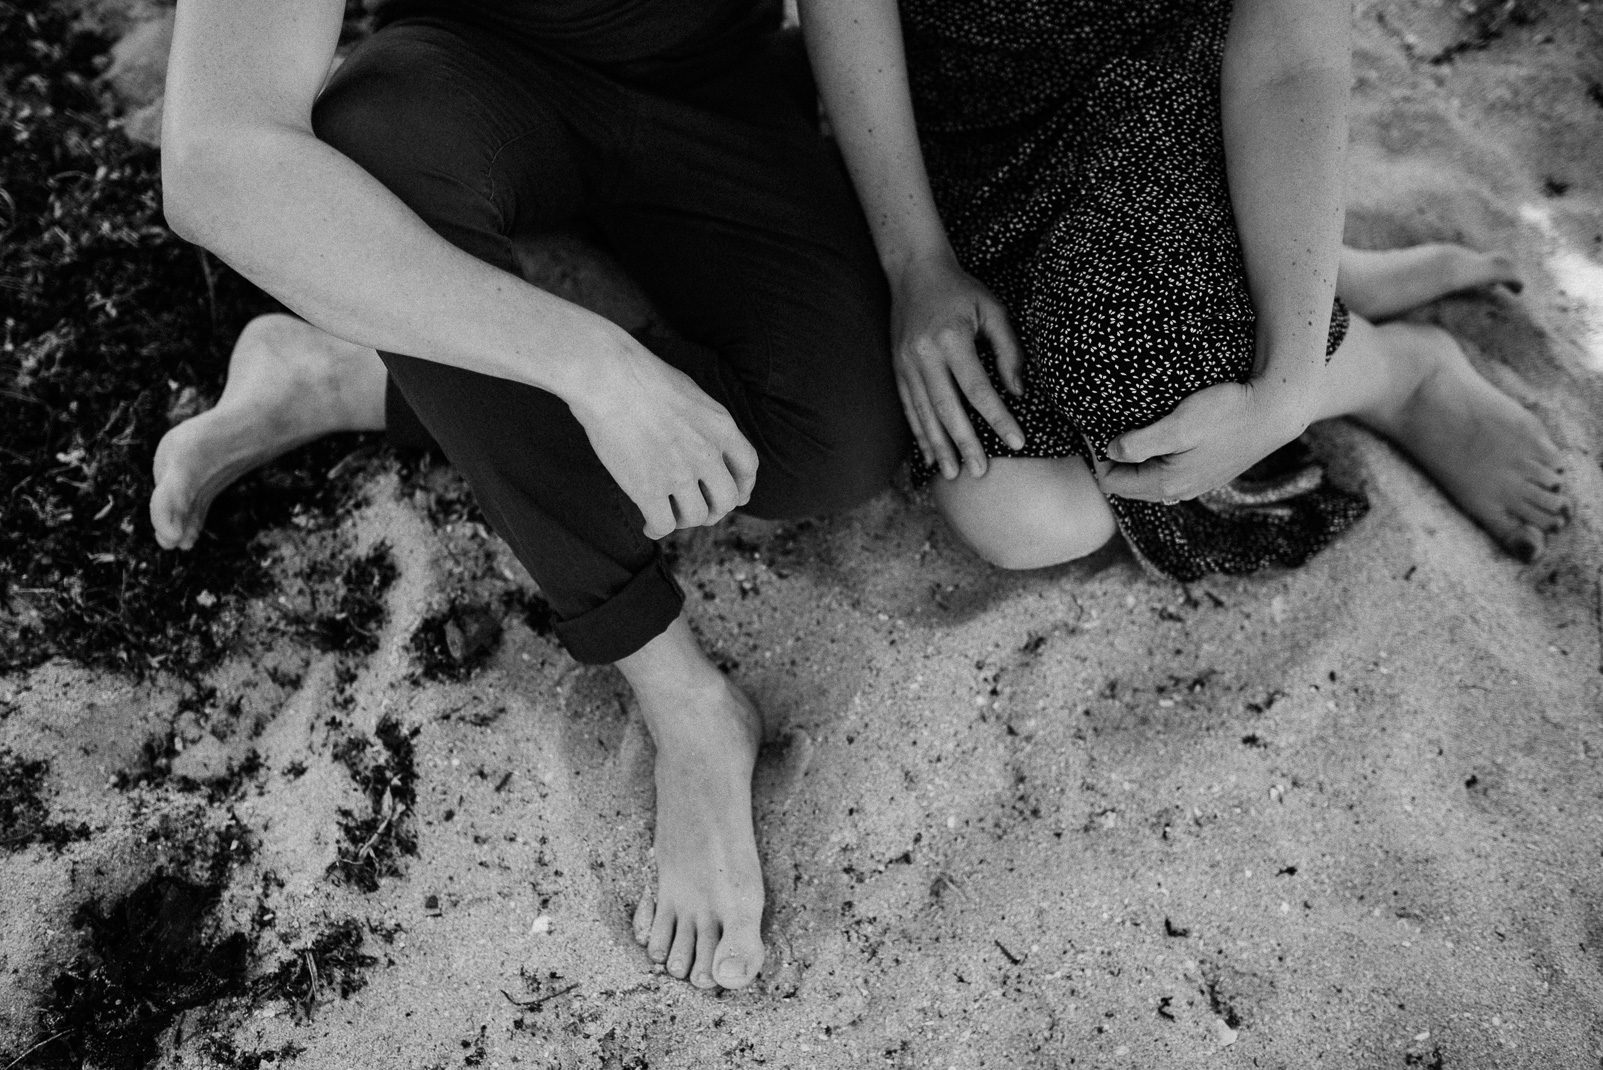 tim-jessica-beach-engagement-prewedding-photography-3.JPG